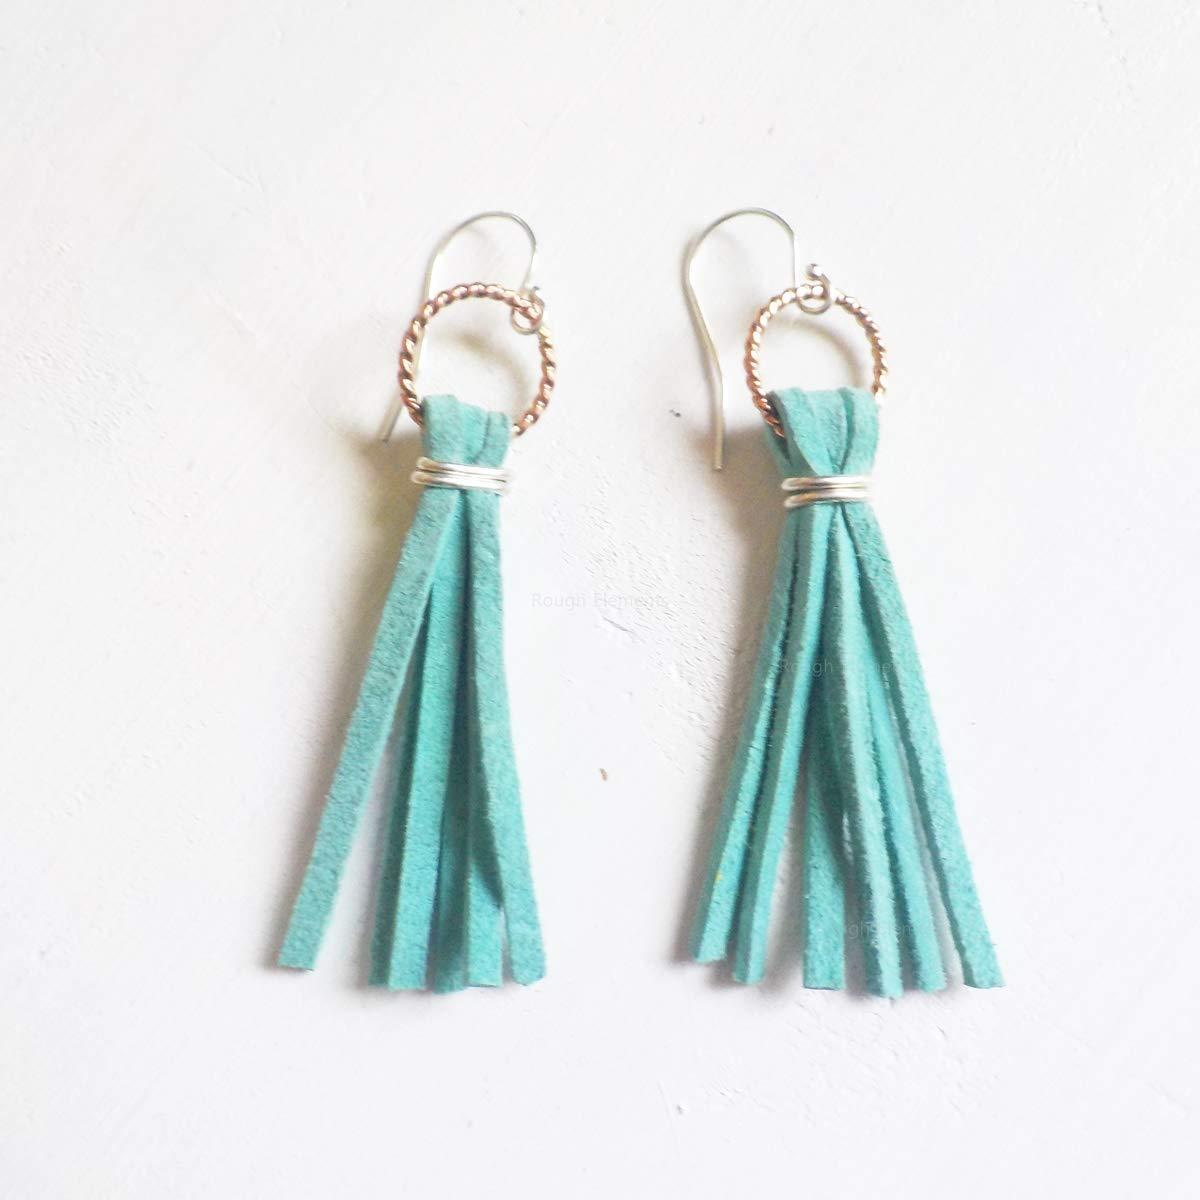 Burnt Orange suede Tassel earrings with Sterling silver hooks